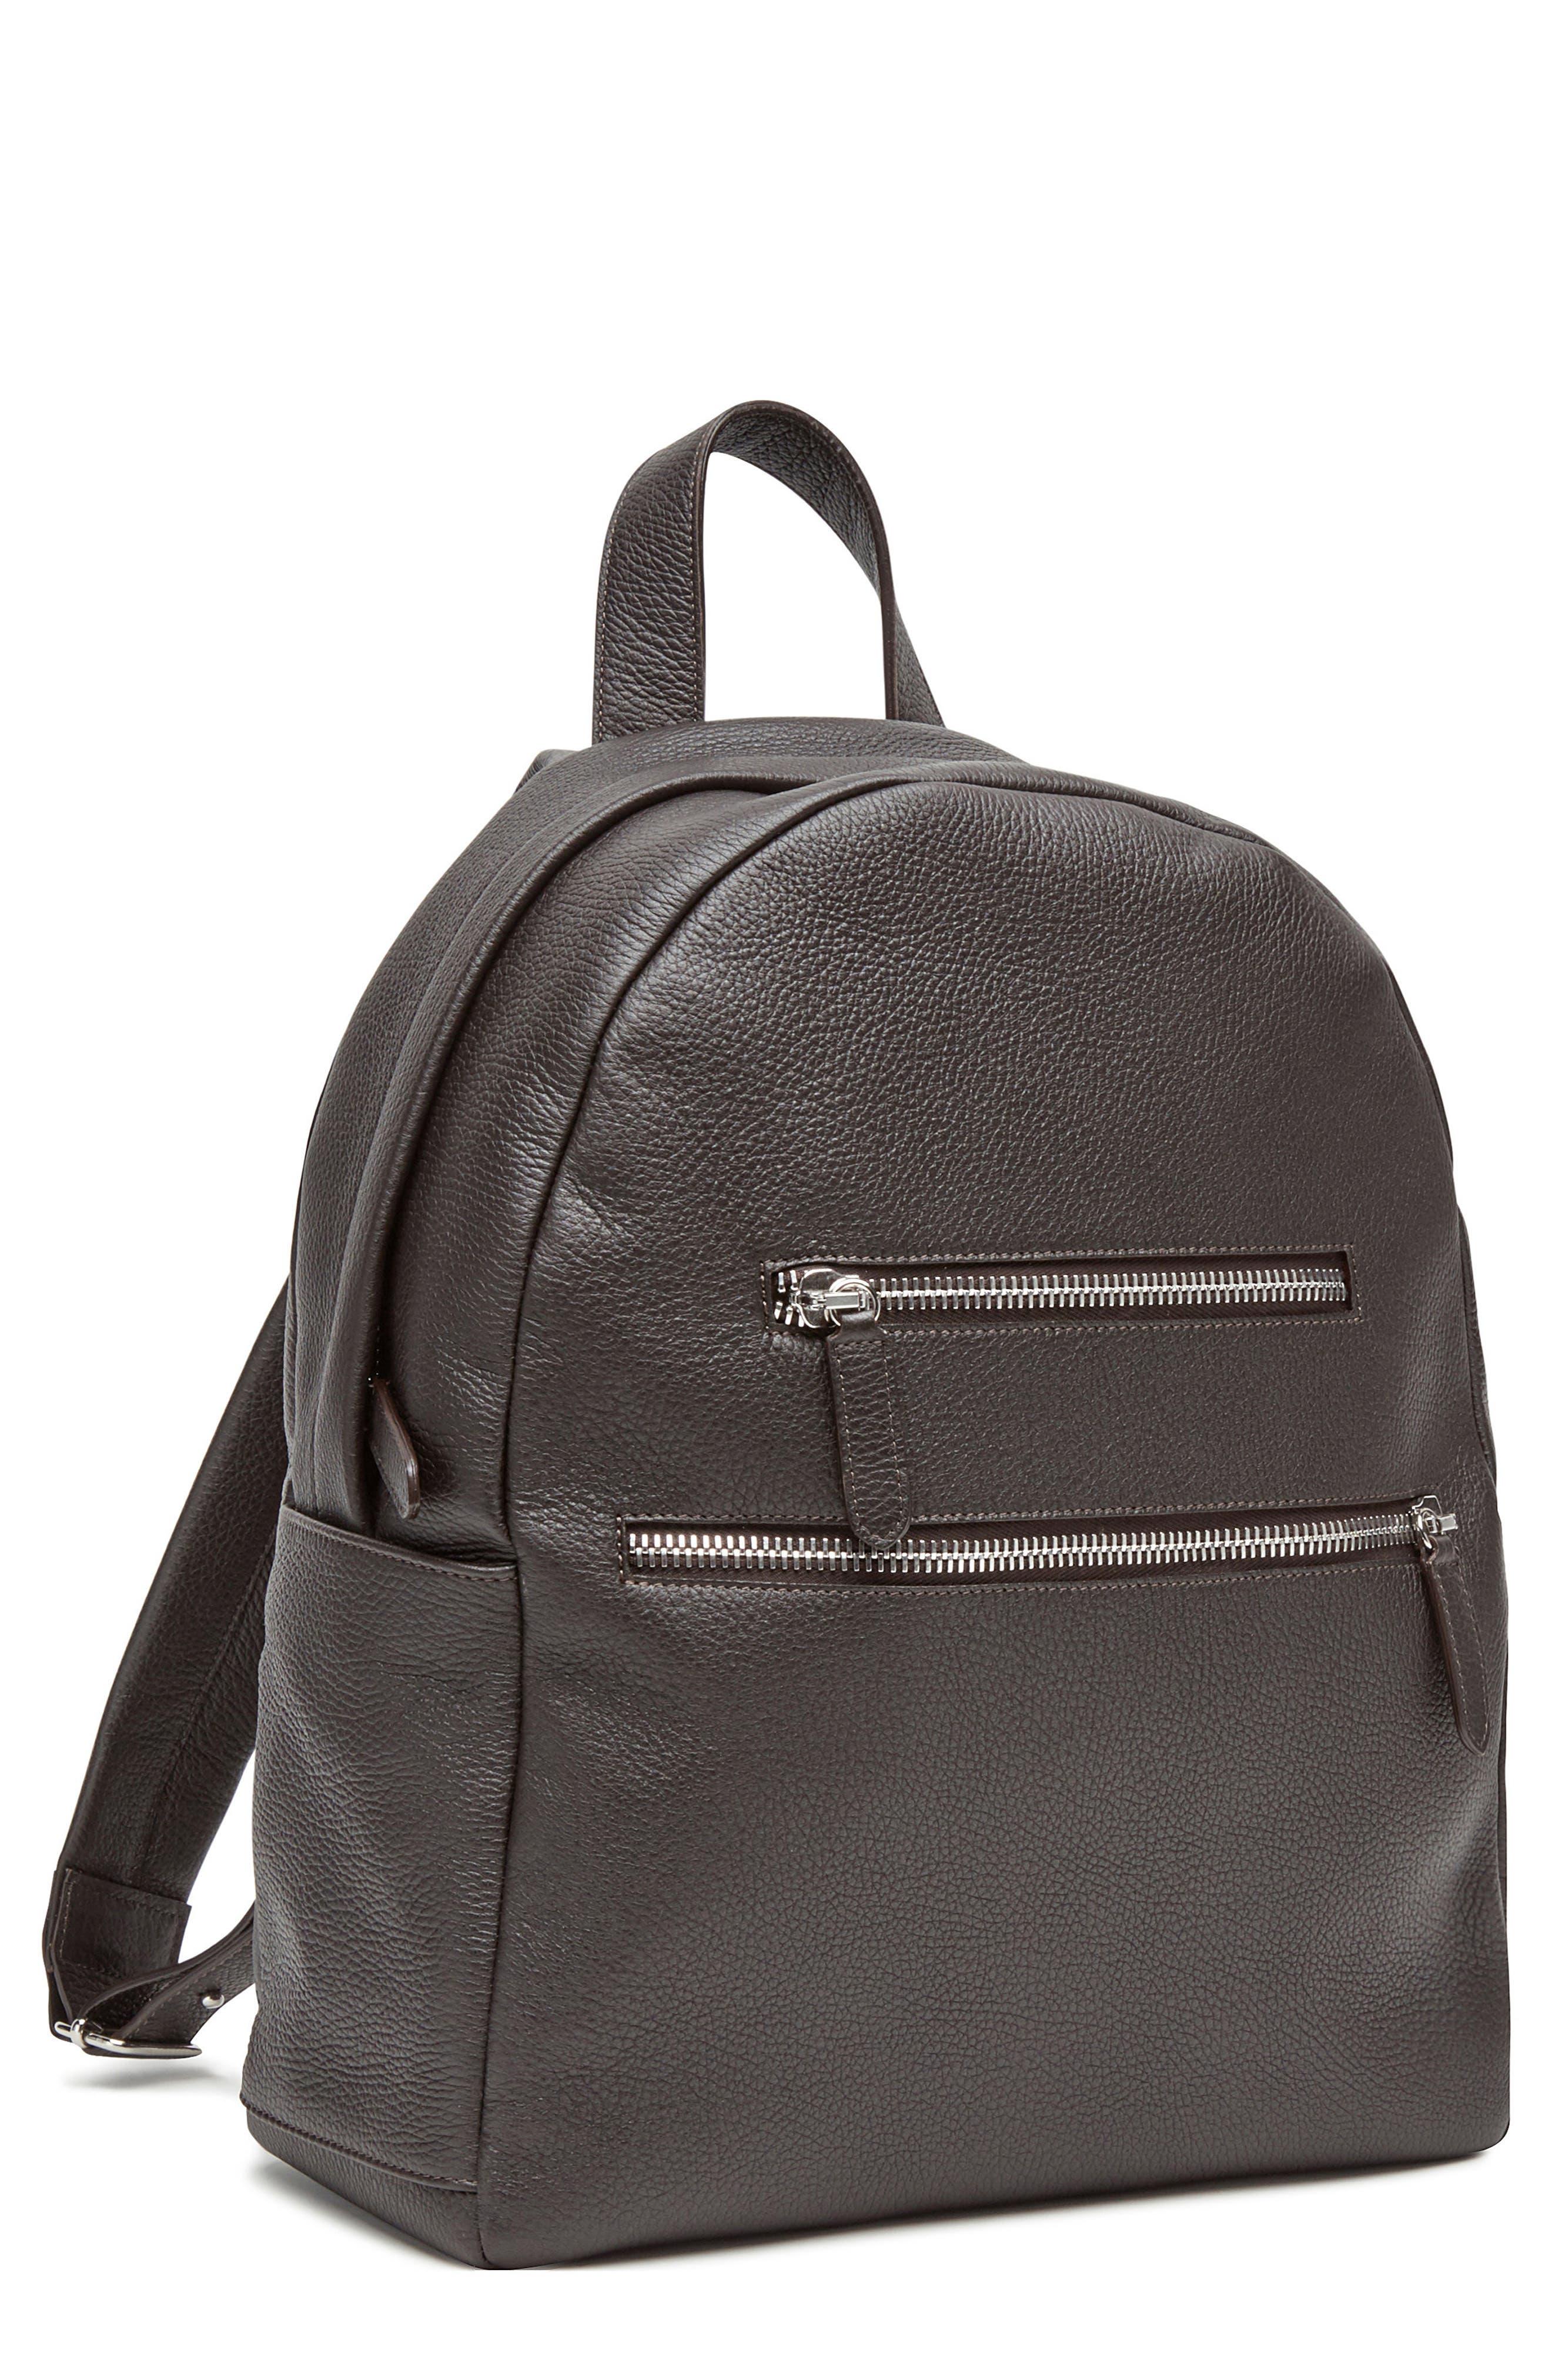 Deerskin Backpack,                             Main thumbnail 1, color,                             200